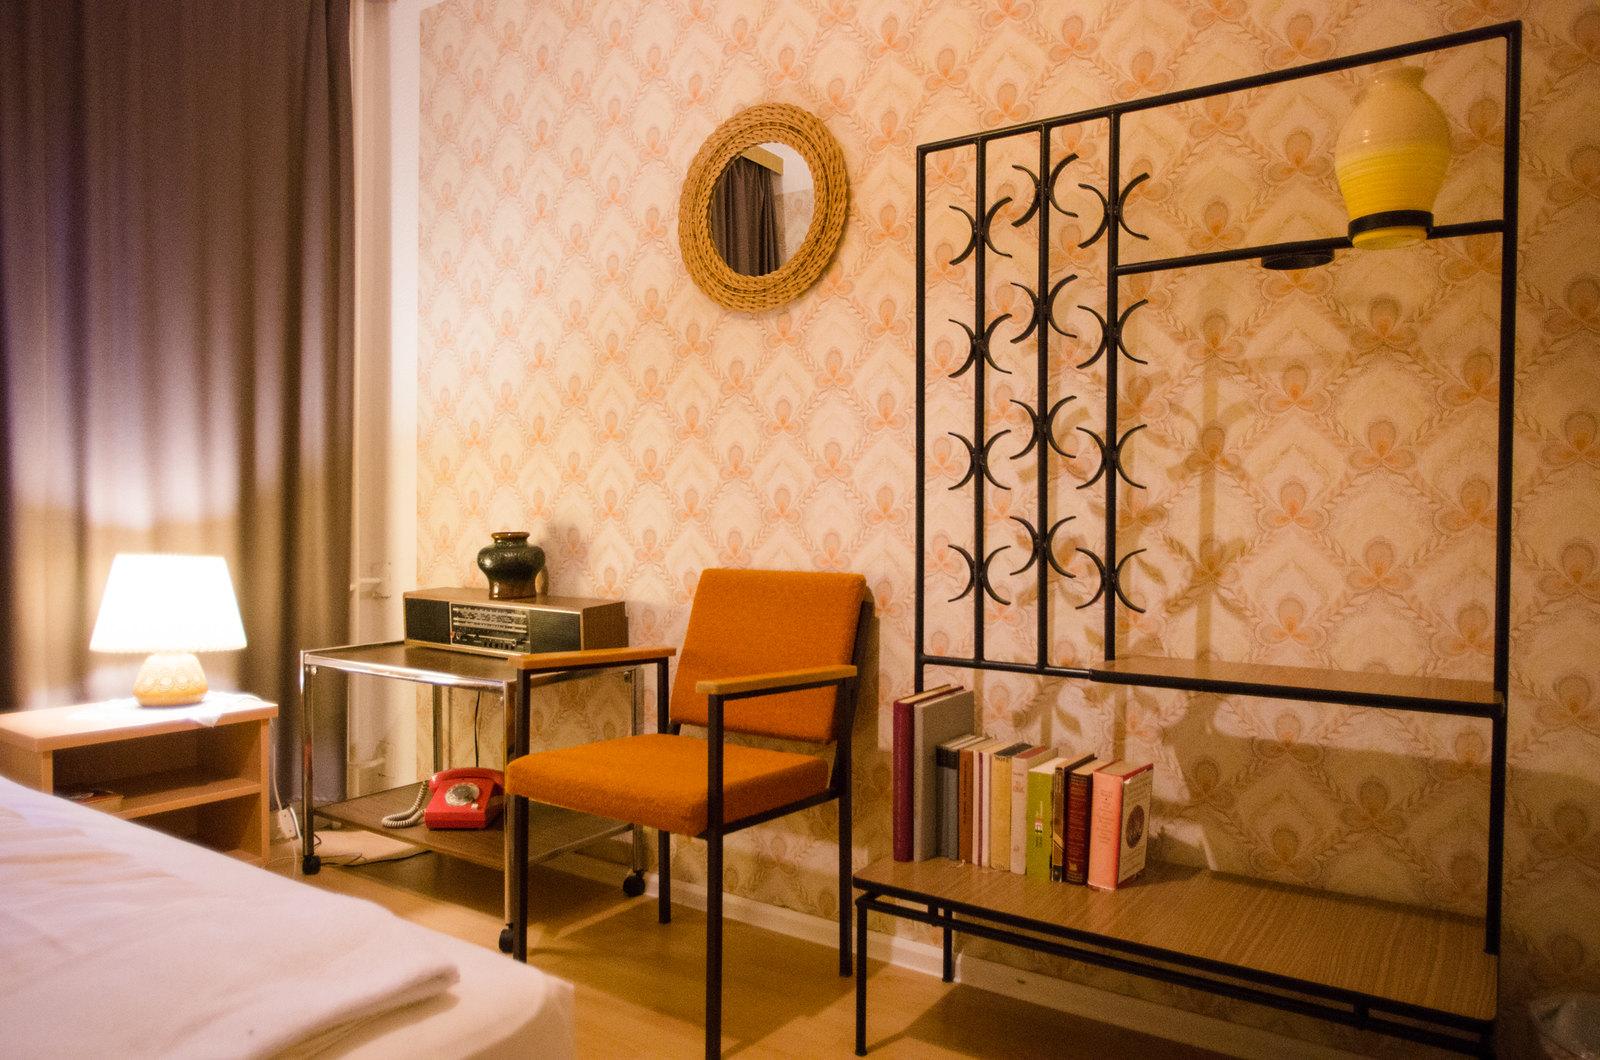 Bons plans Berlin - DDR Ostel Design Hostel